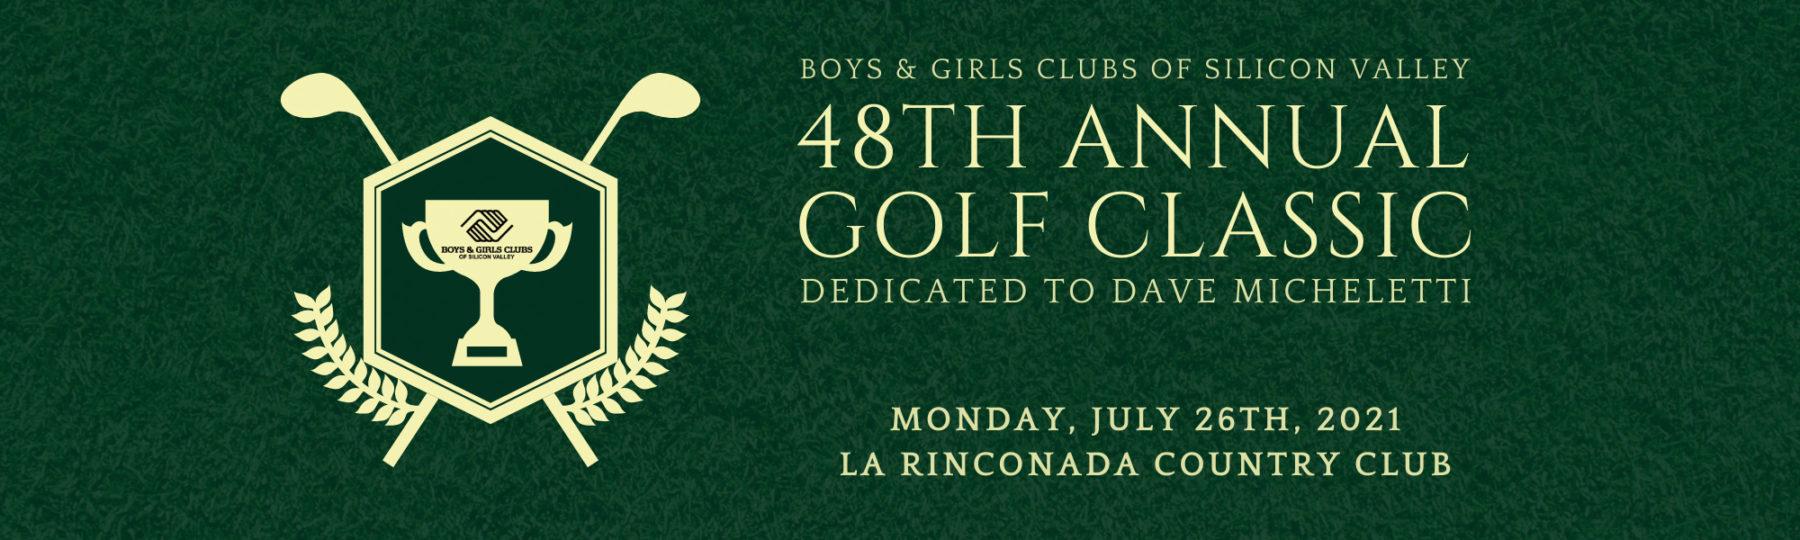 48th annual golf classic